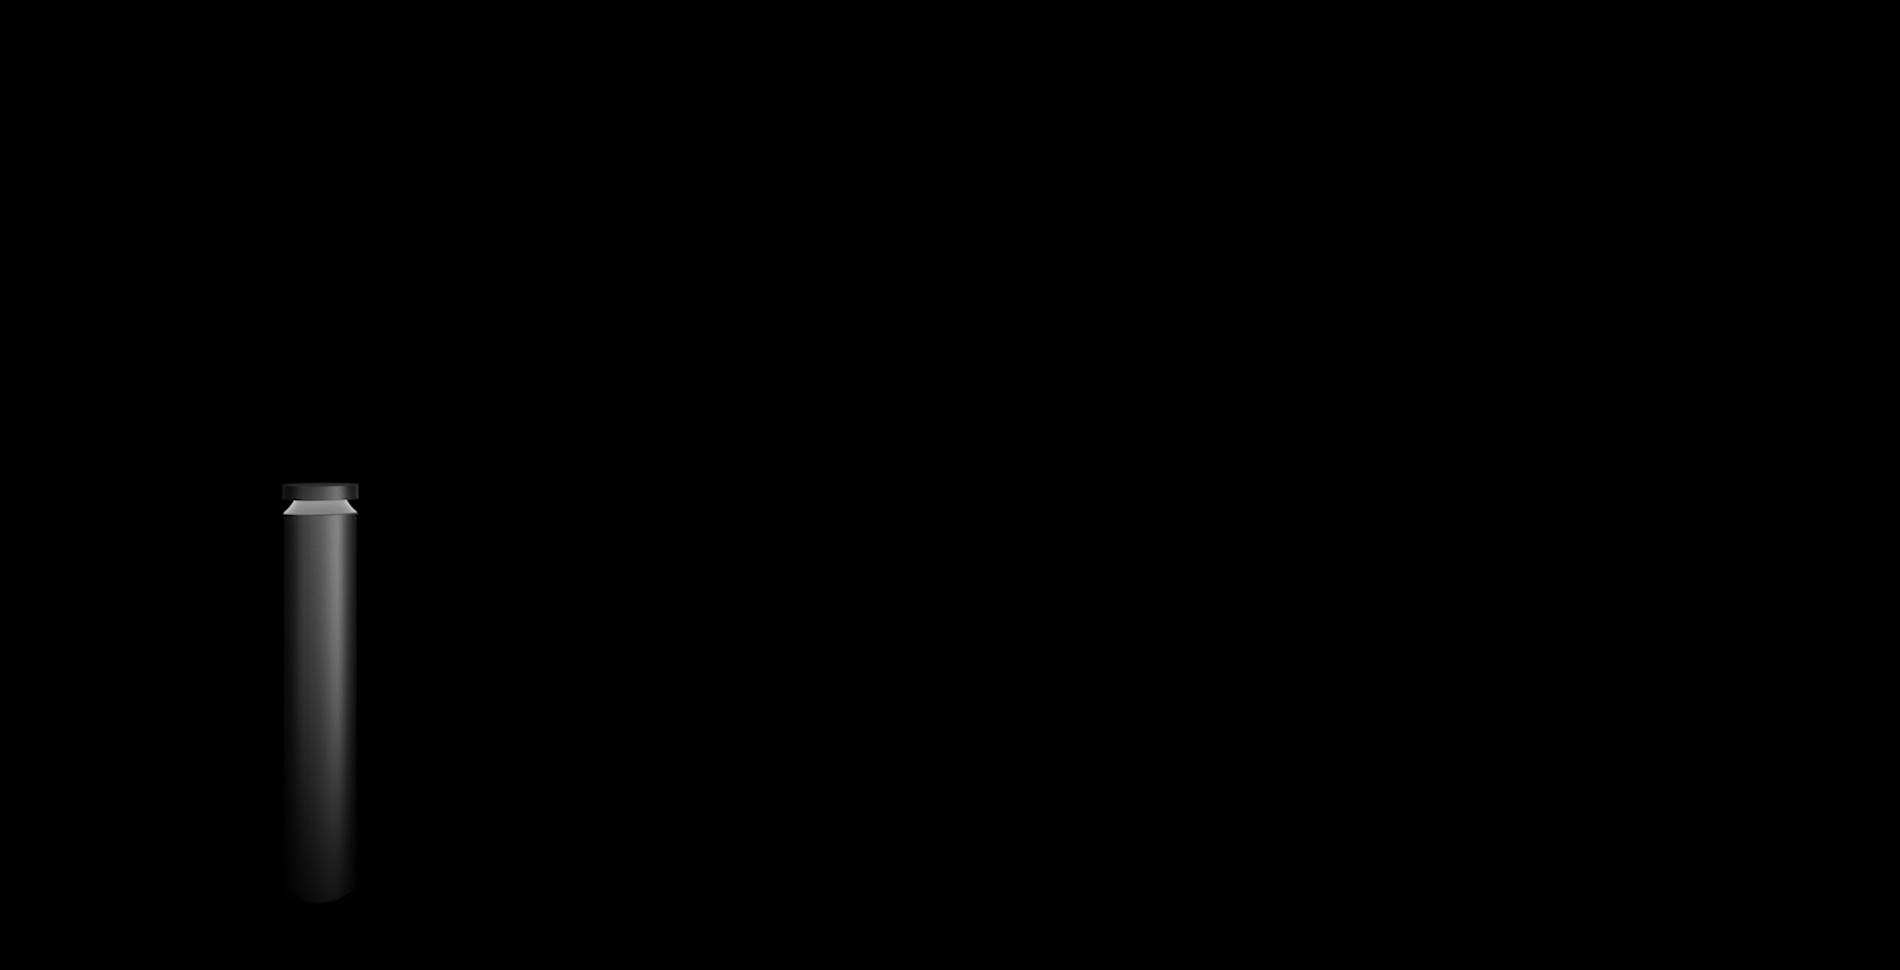 Sequenza-0226